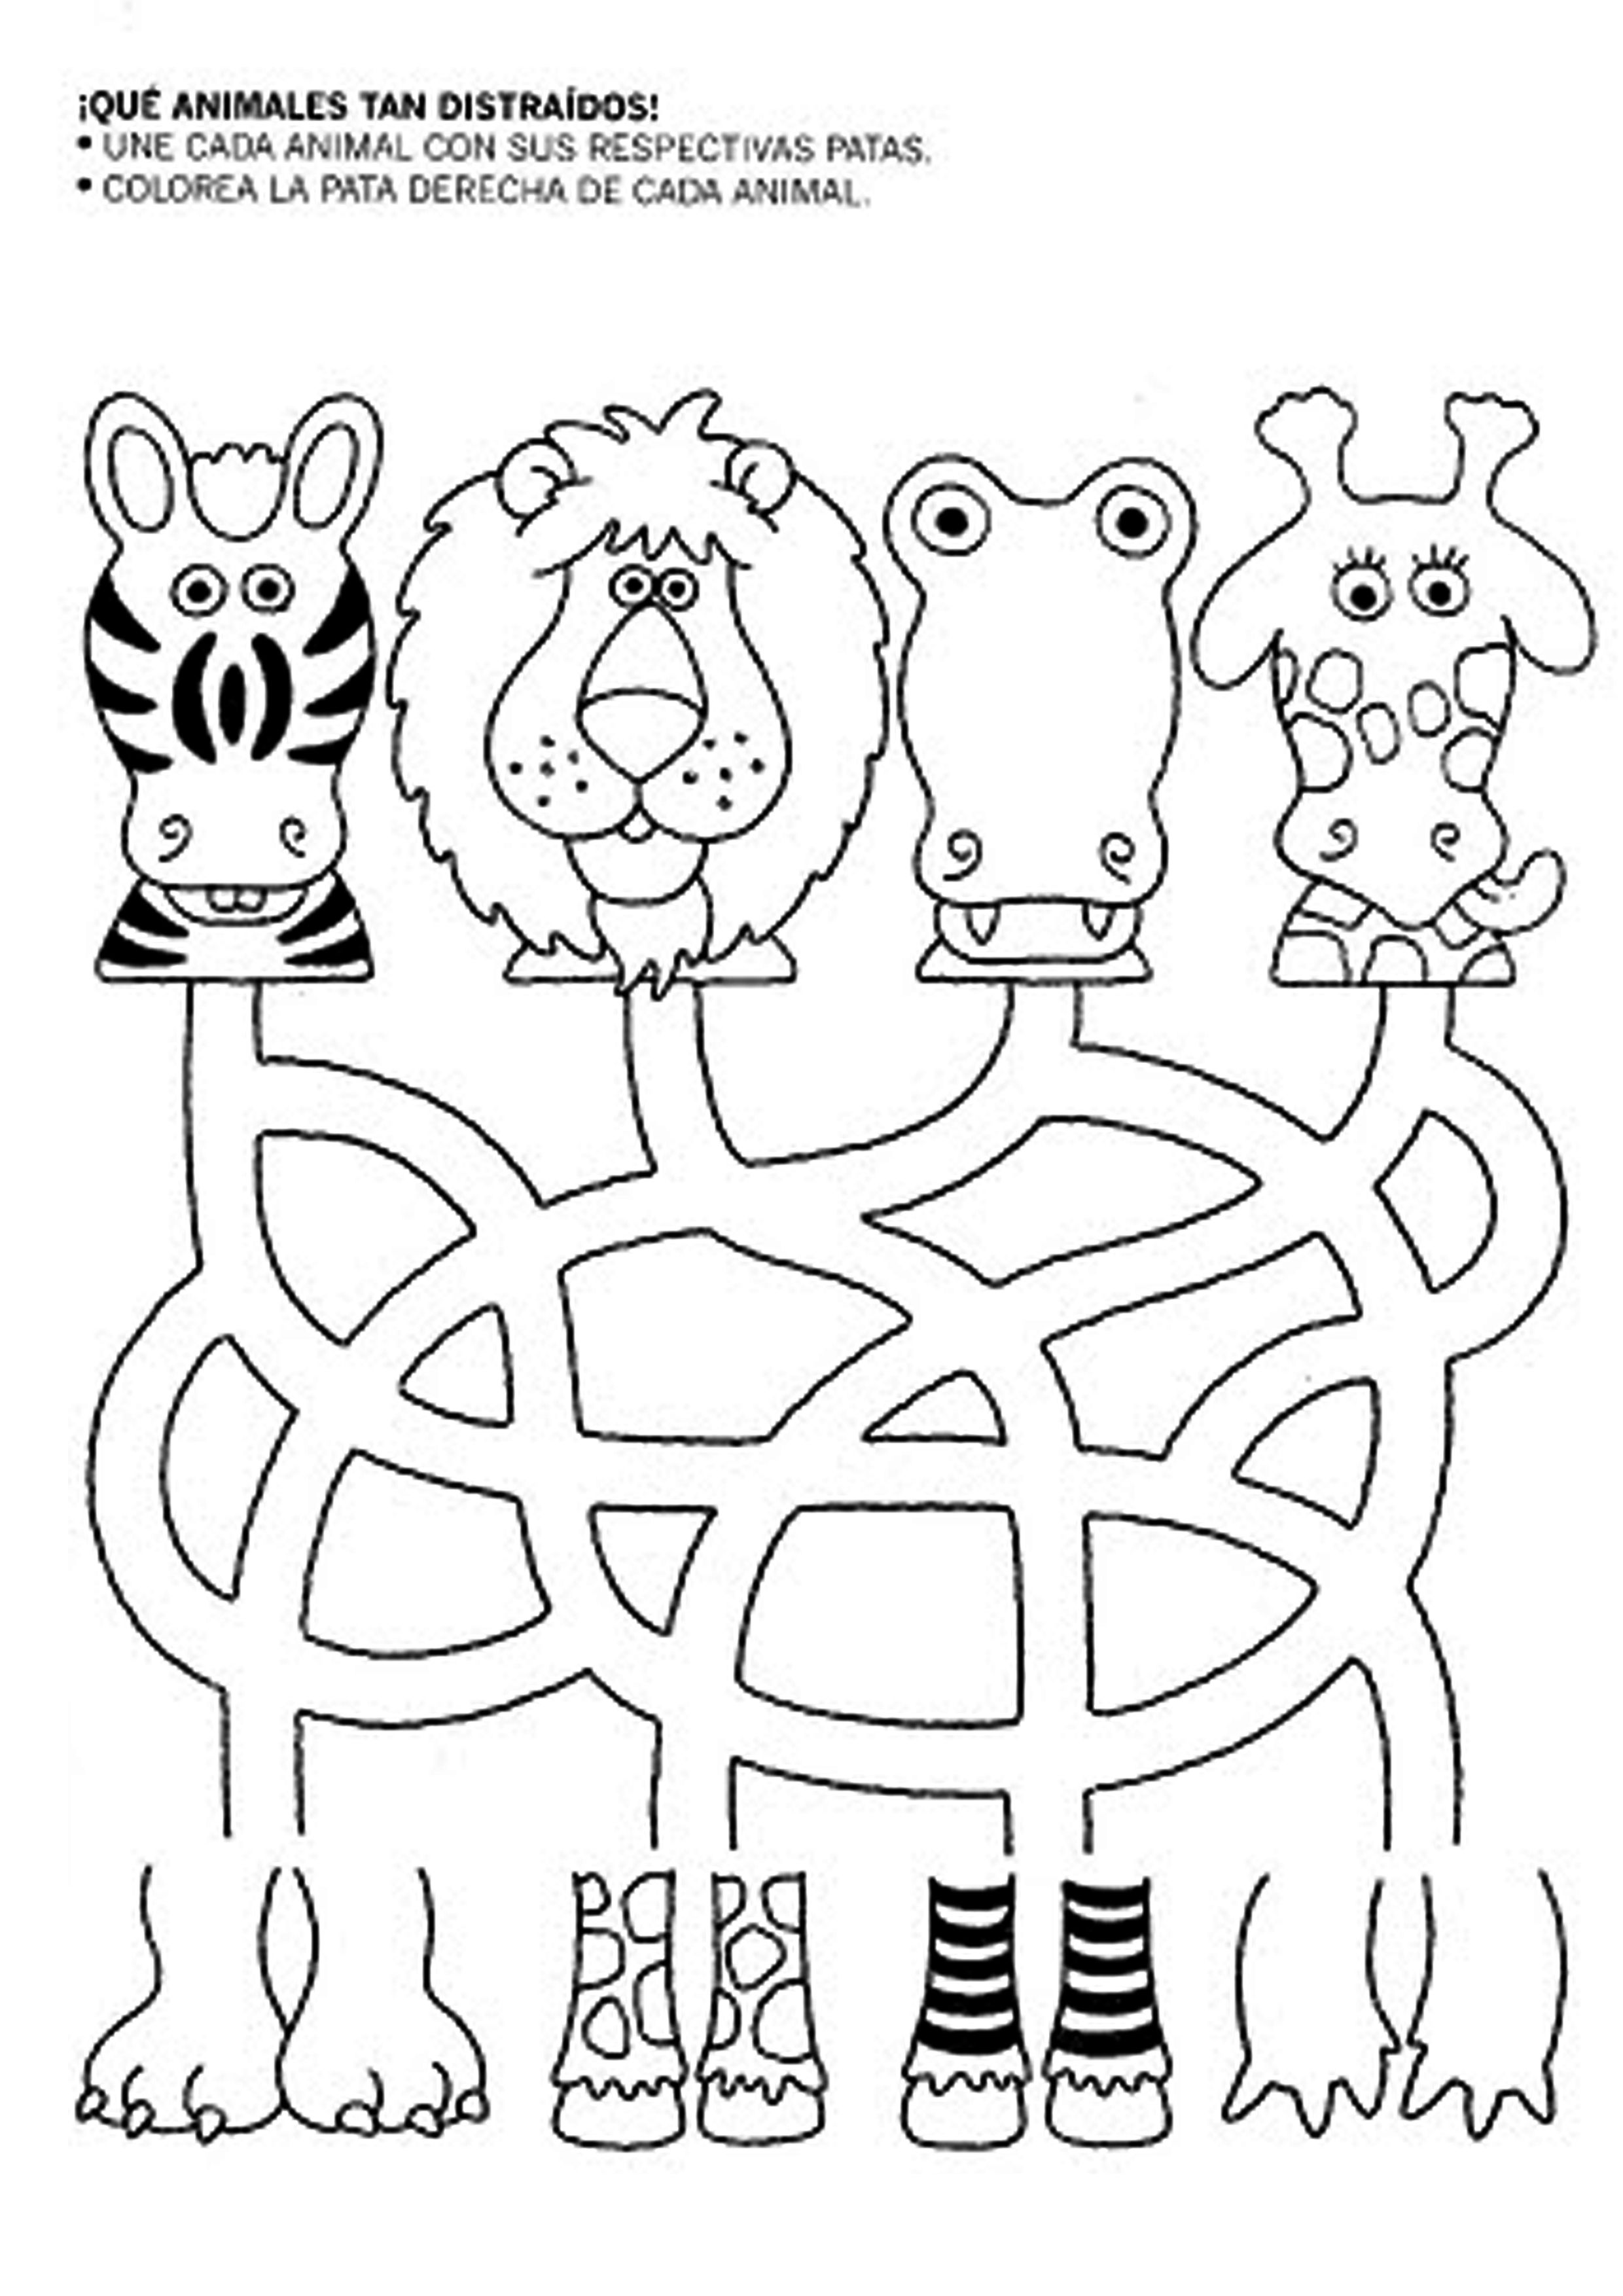 Colouring worksheets for lkg - Animales Y Sus Patas Animal Headsmazelkg Worksheetsprintable